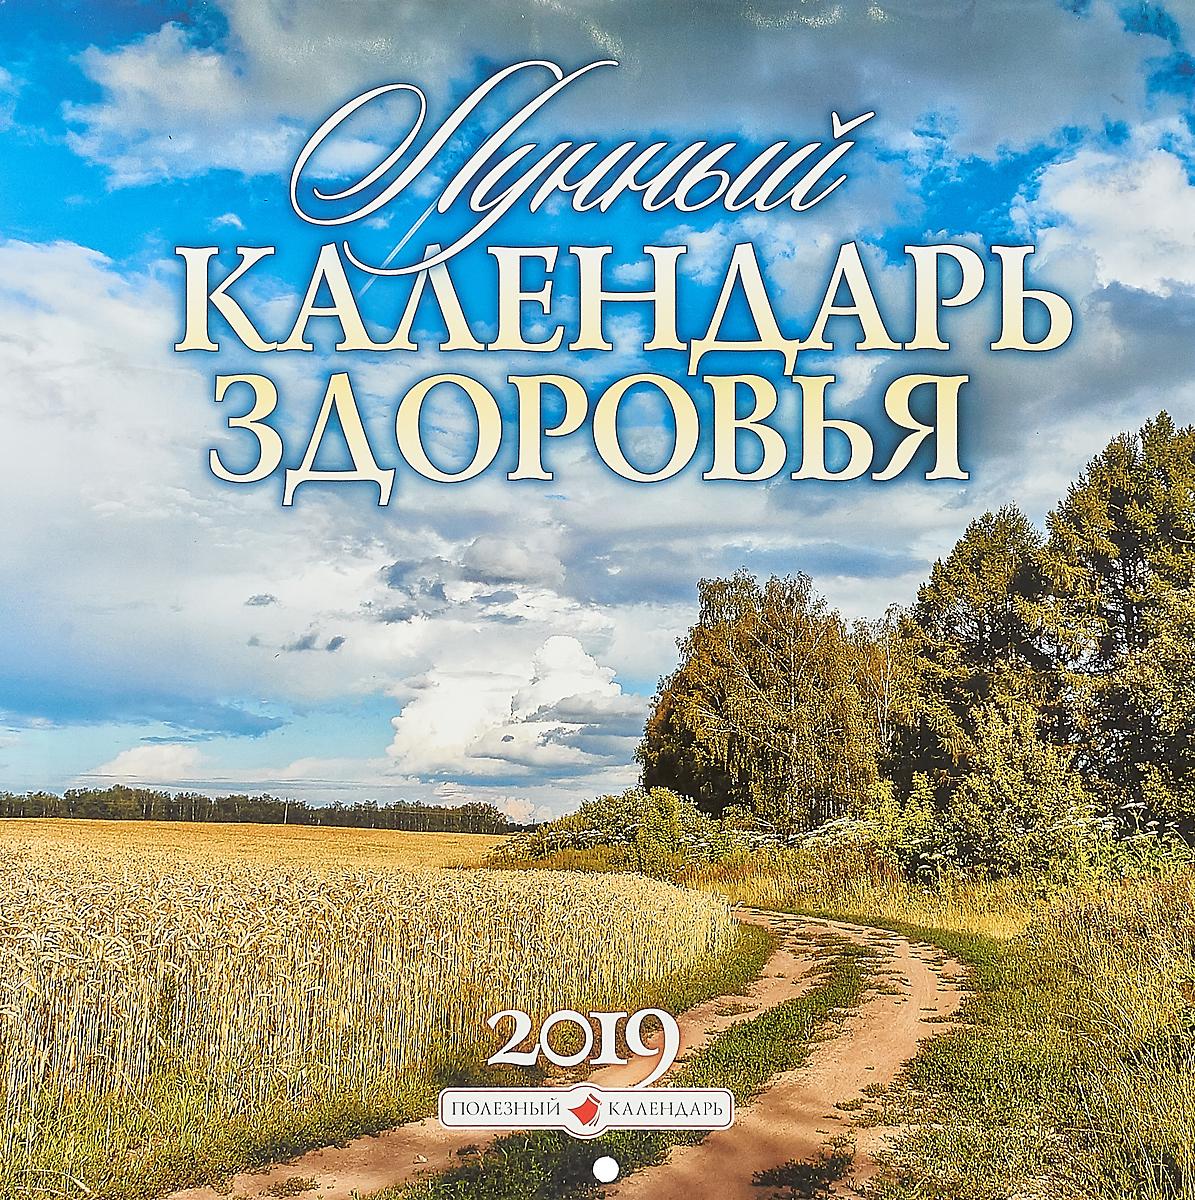 Календарь перекидной на 2019 год. Лунный календарь здоровья календарь здоровья на 2009 год